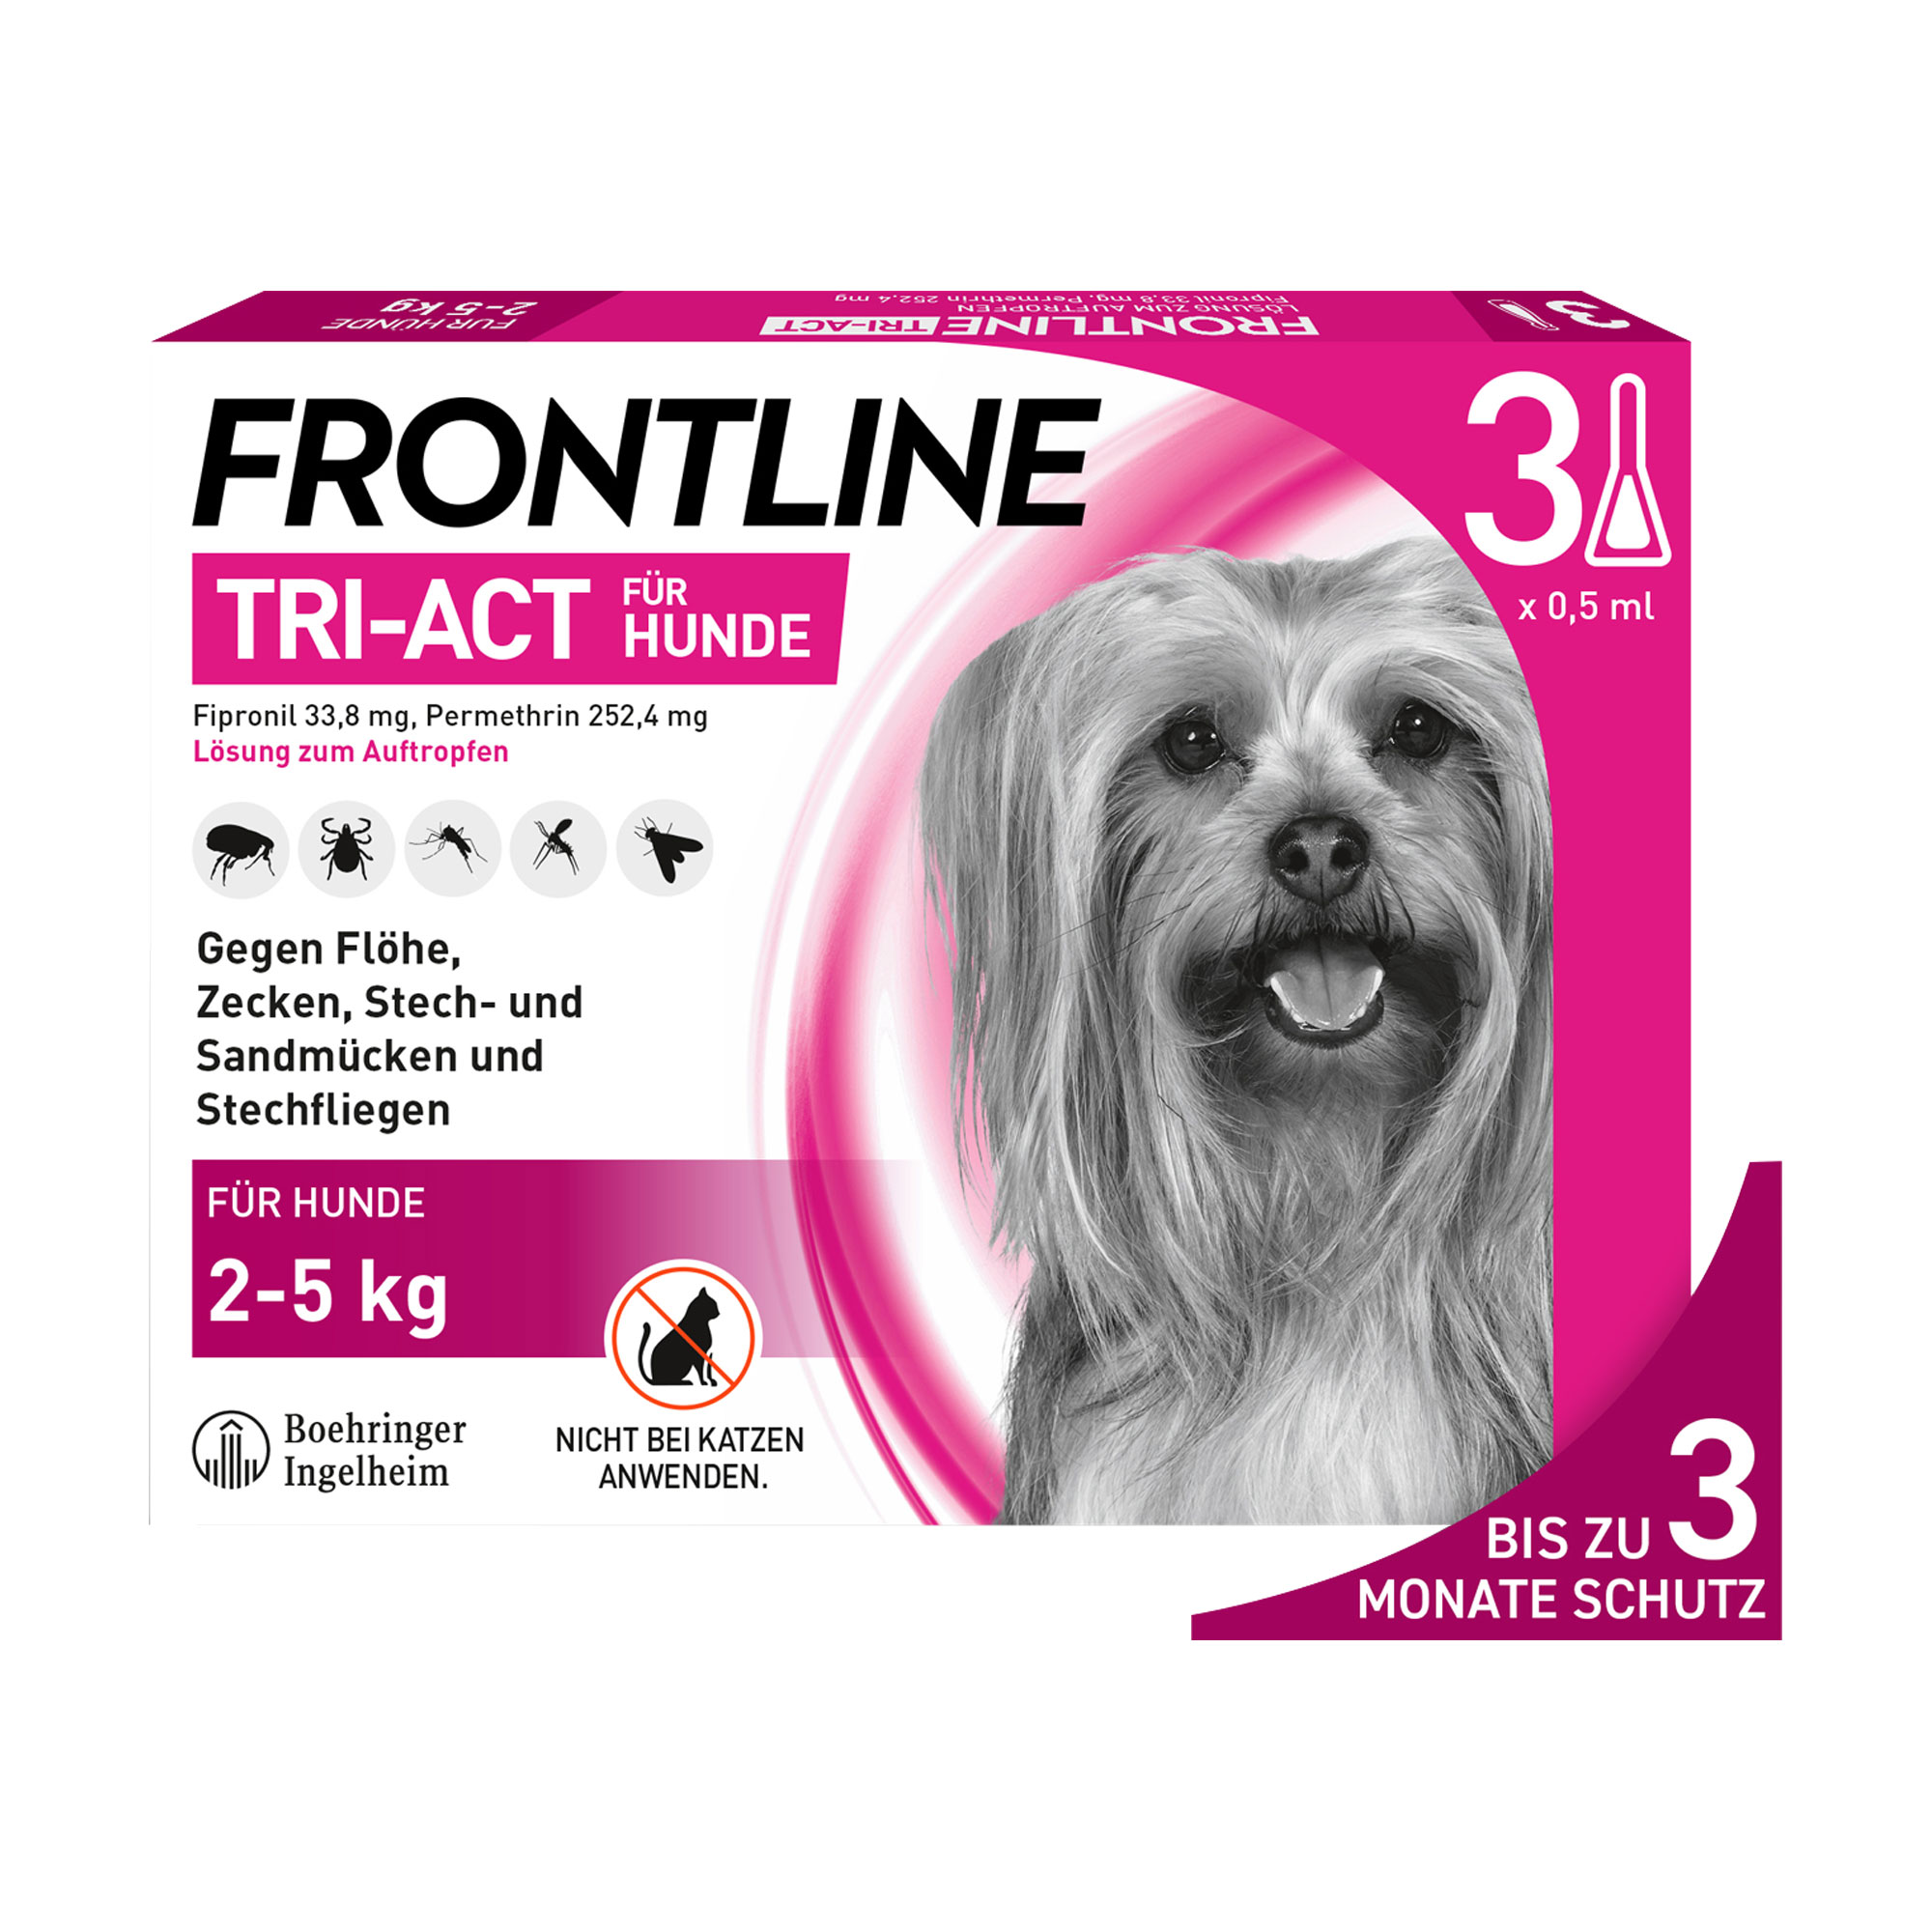 Frontline Tri-Act Hunde 2-5 kg